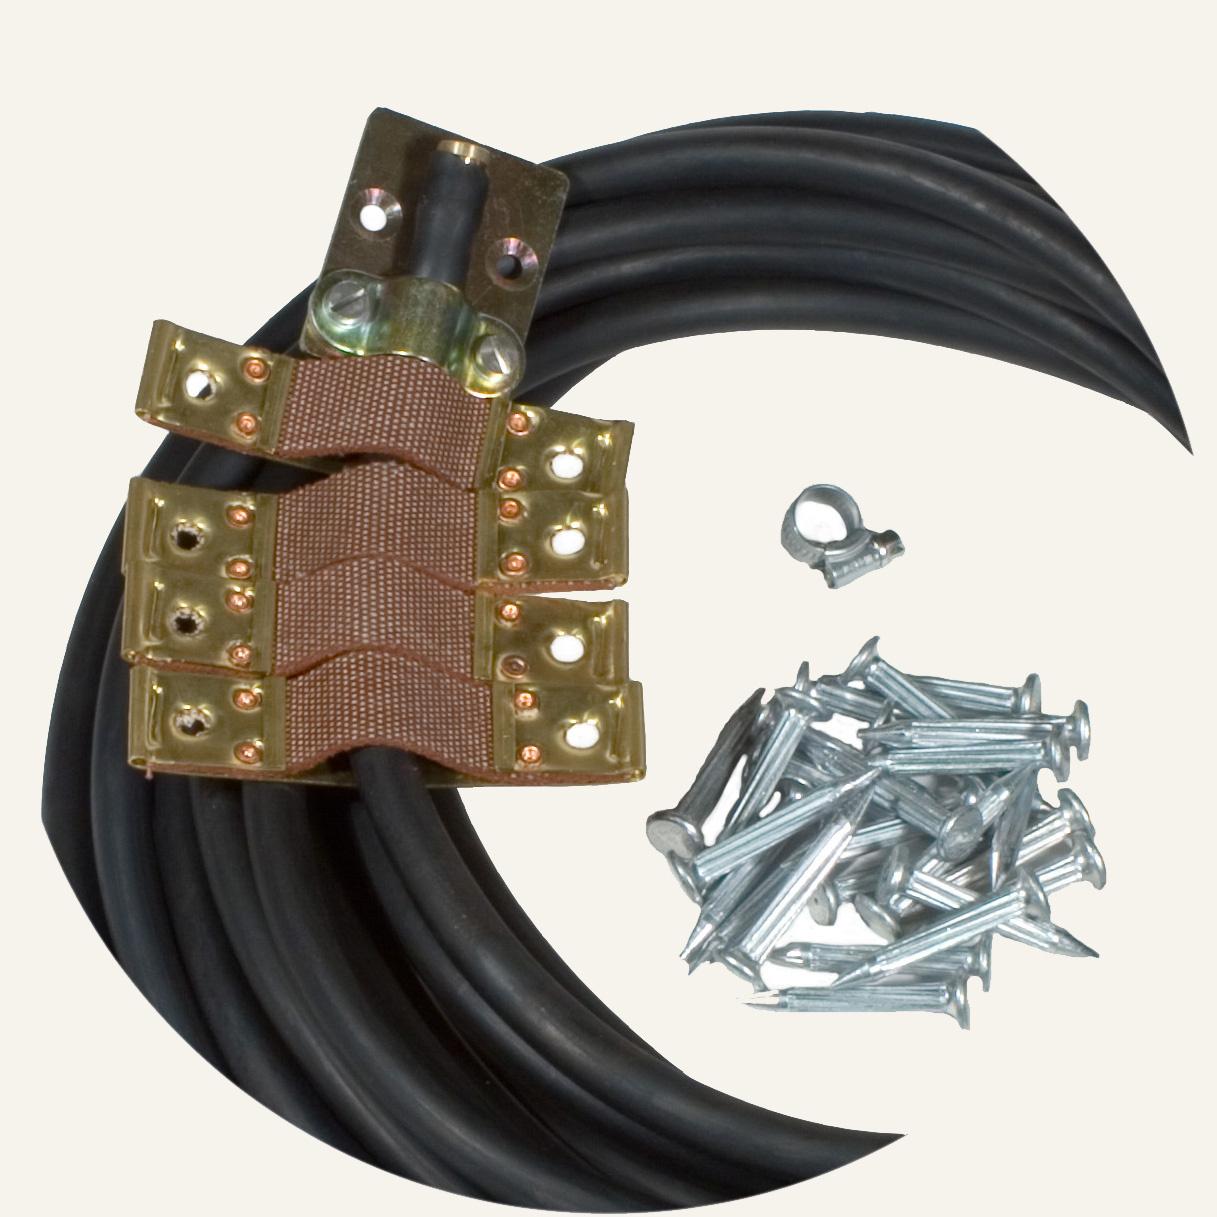 tube fitting kit